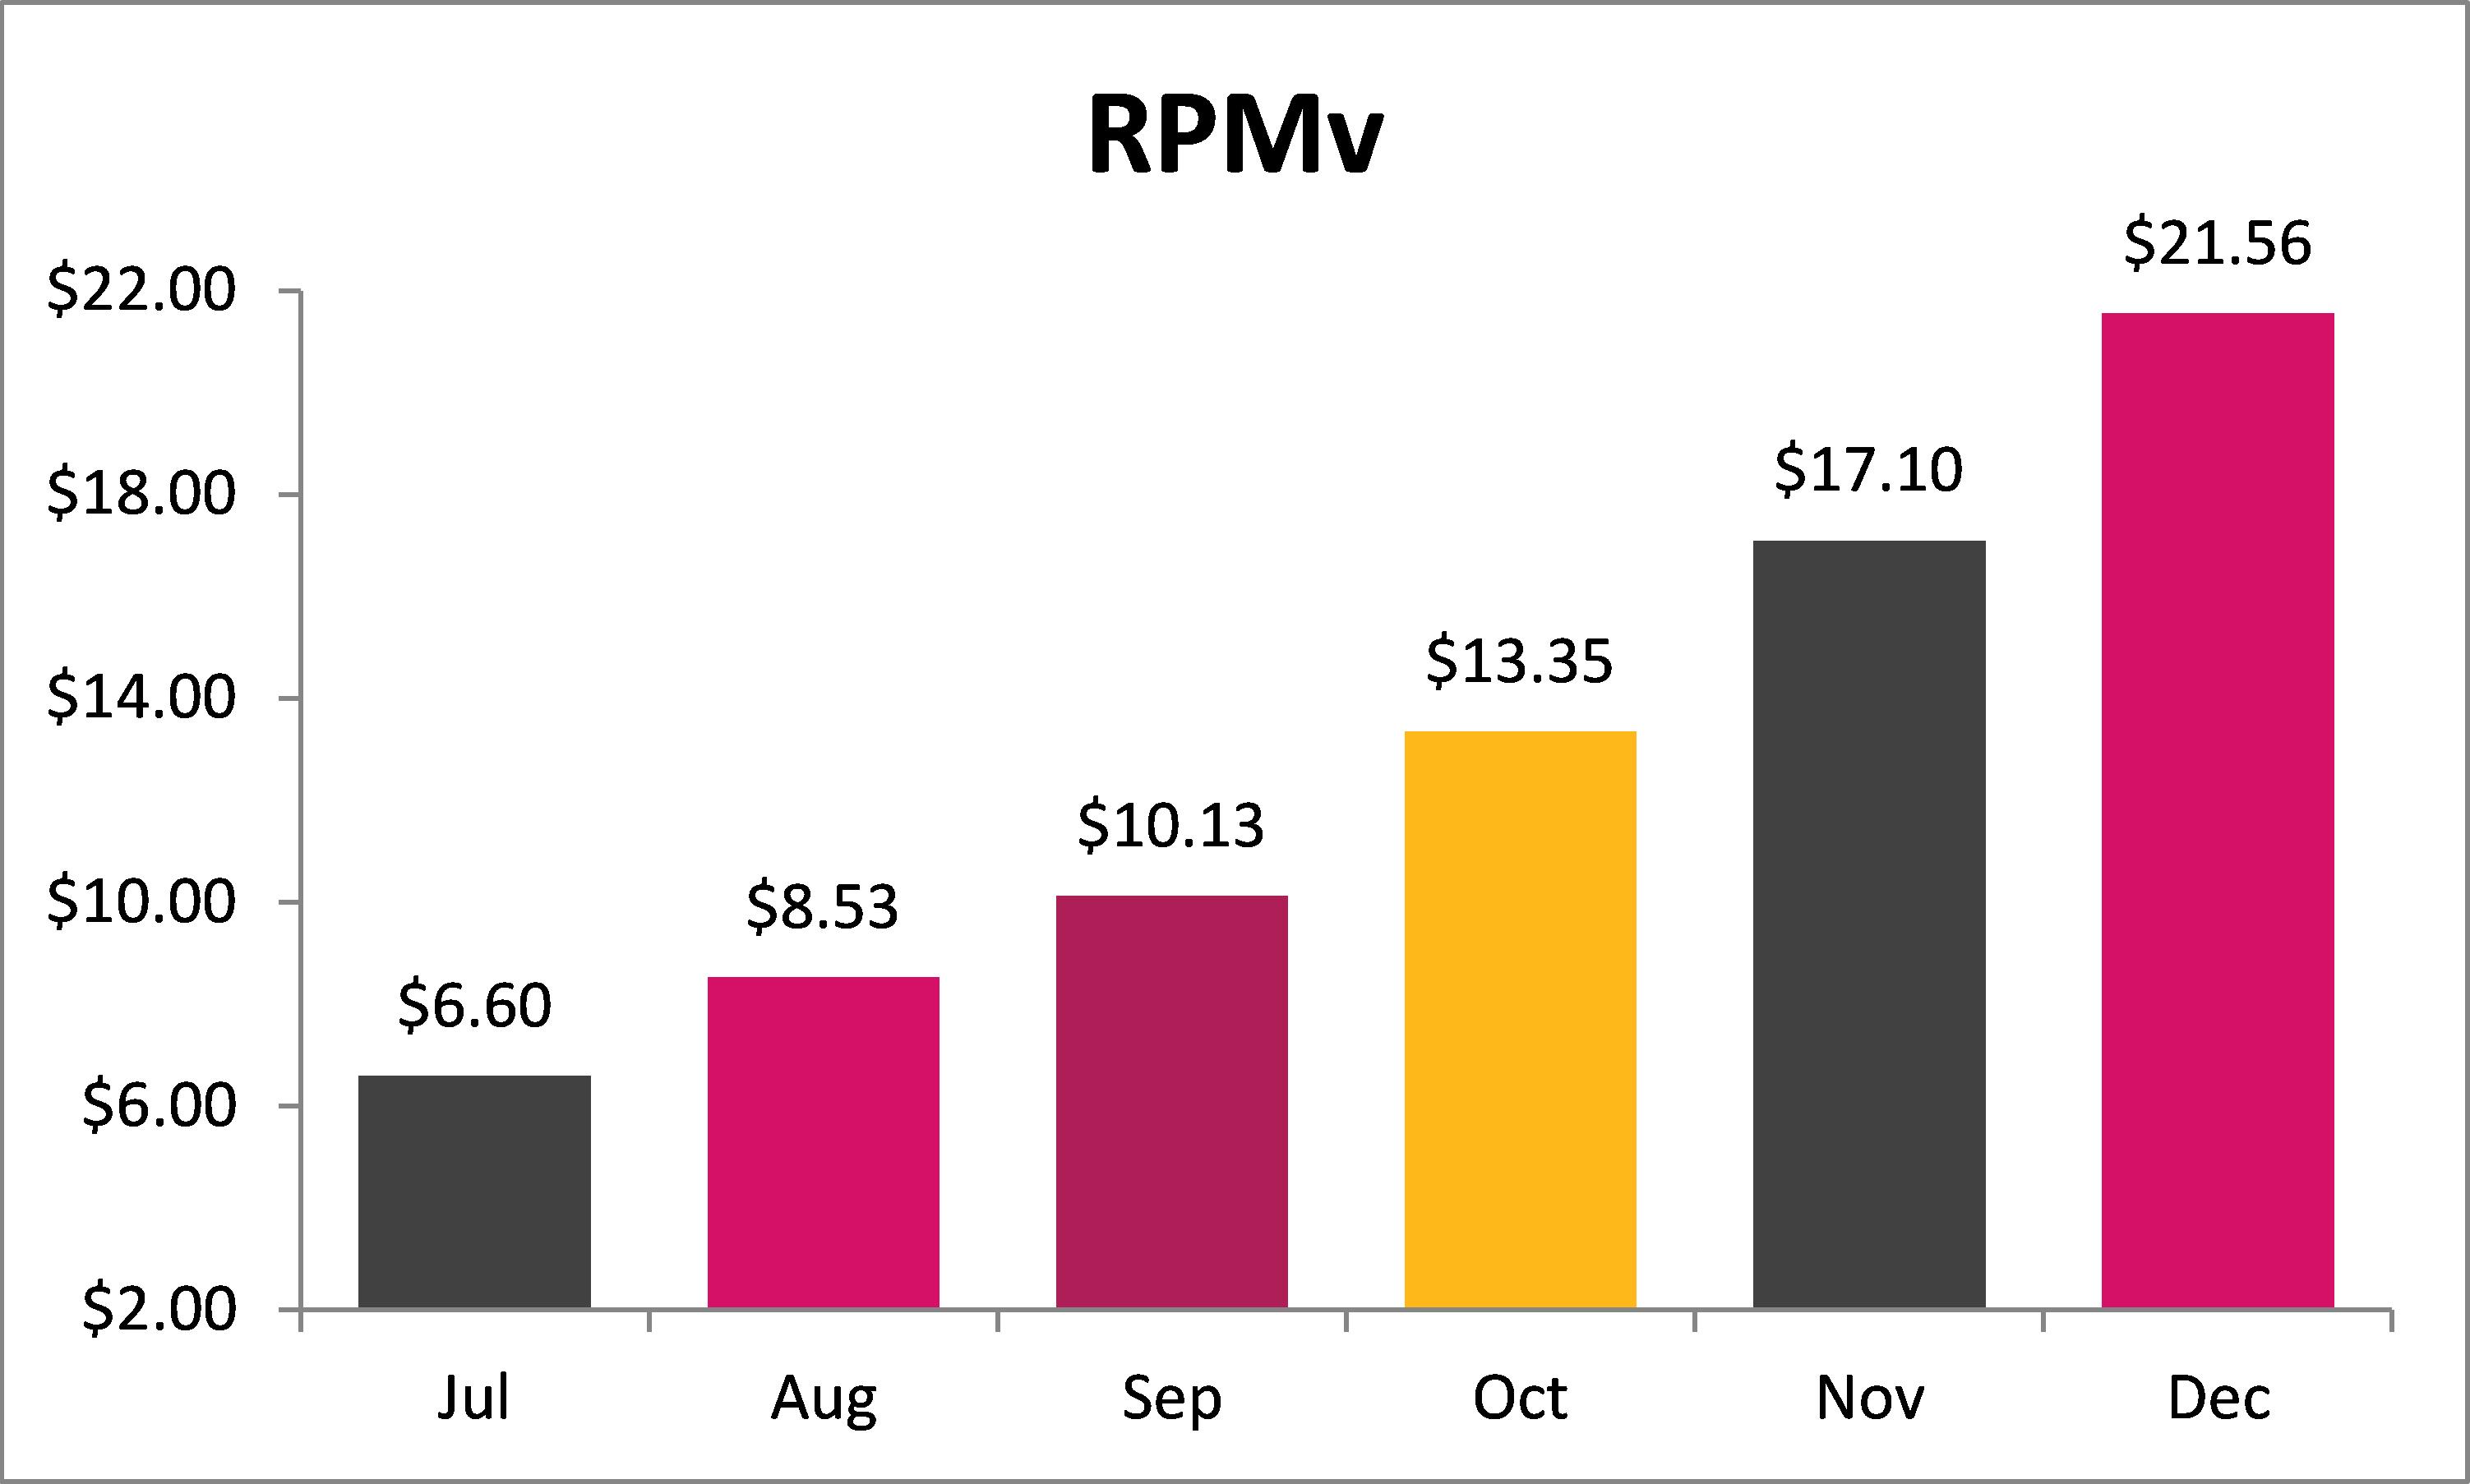 Function(X), Inc. - Key Performance Indicators (Publishing Segment) (RPMv = Revenue Per 1,000 Visits)